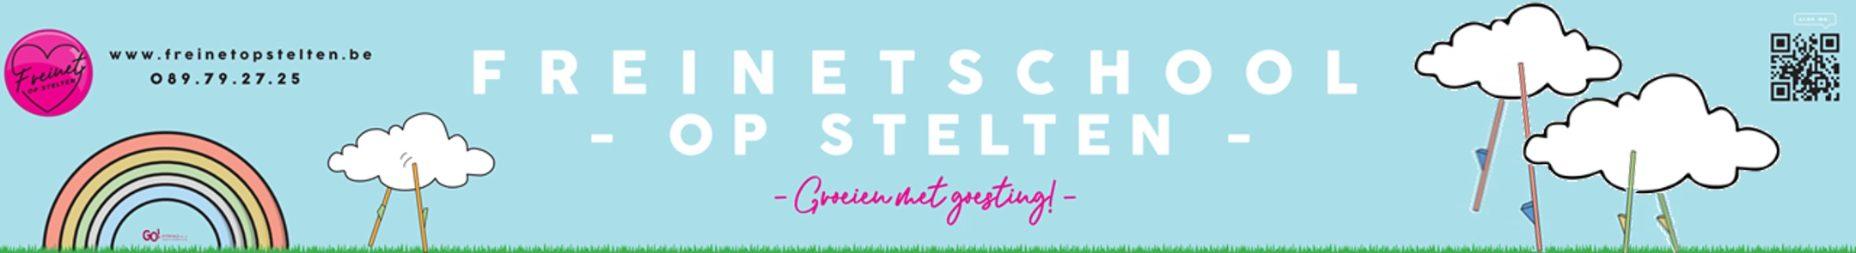 GO! BS FREINETSCHOOL Op Stelten!